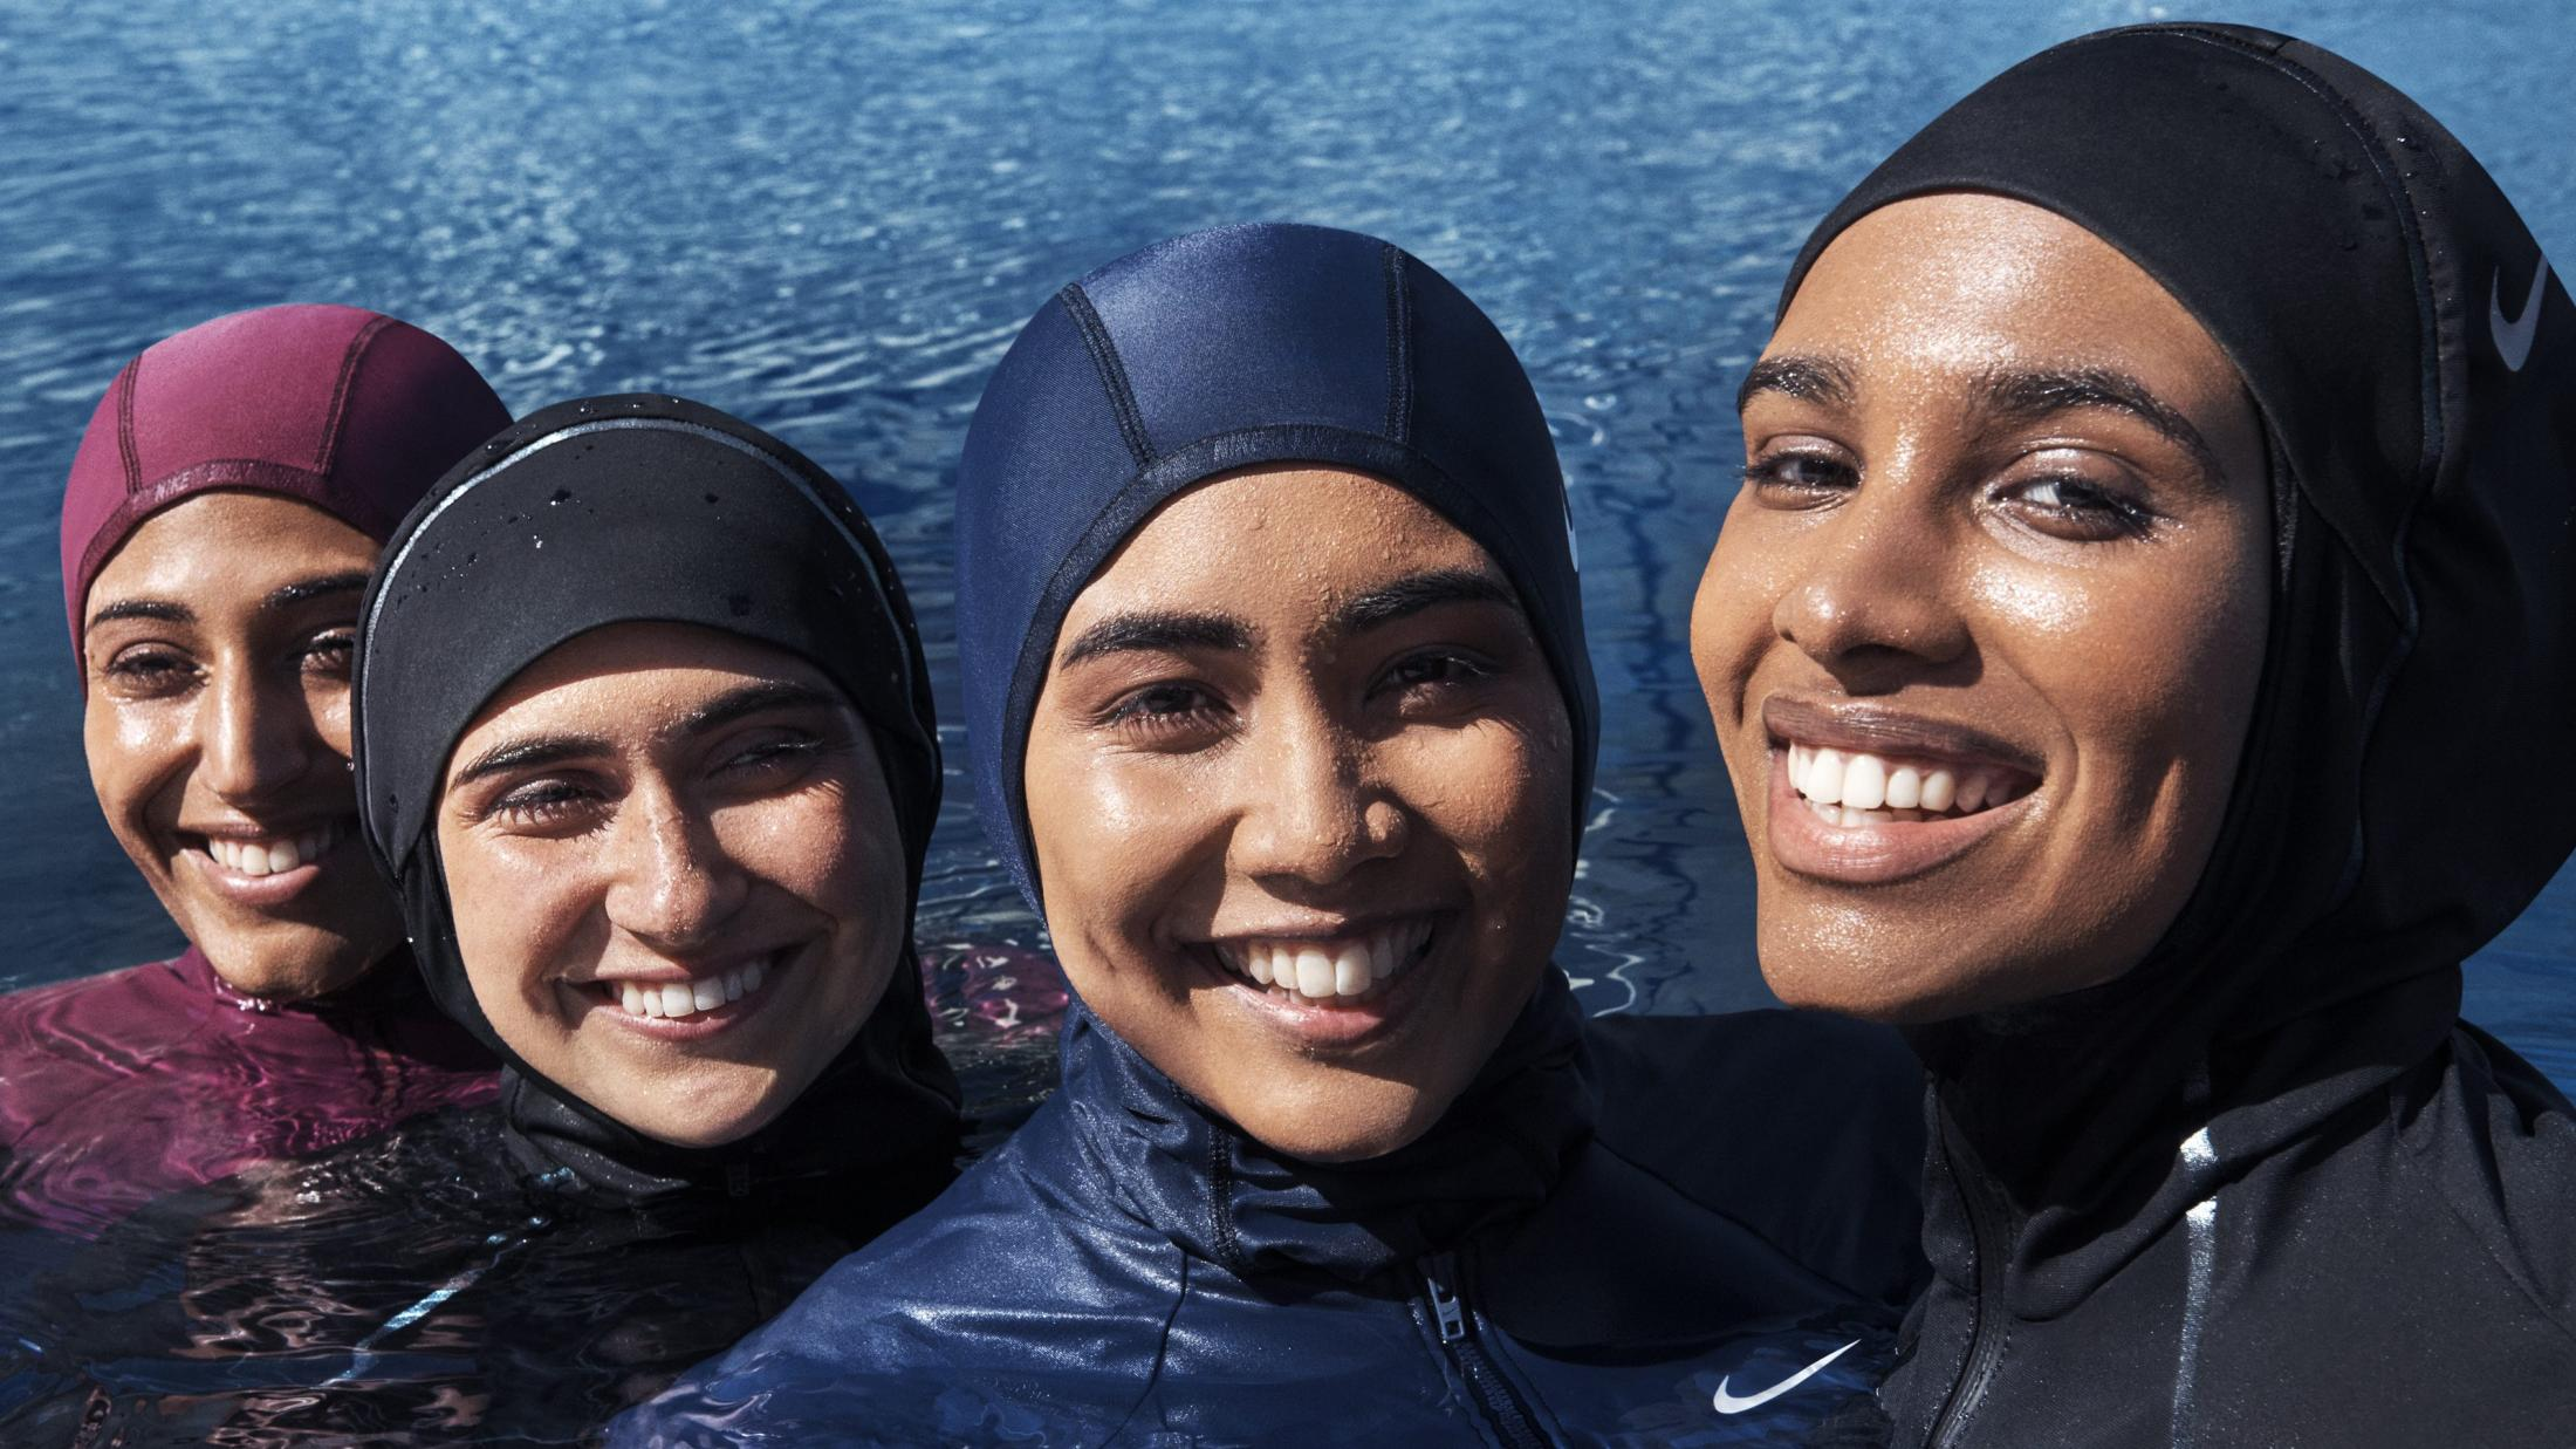 Nike's modest swimwear courts a growing Muslim clothing market